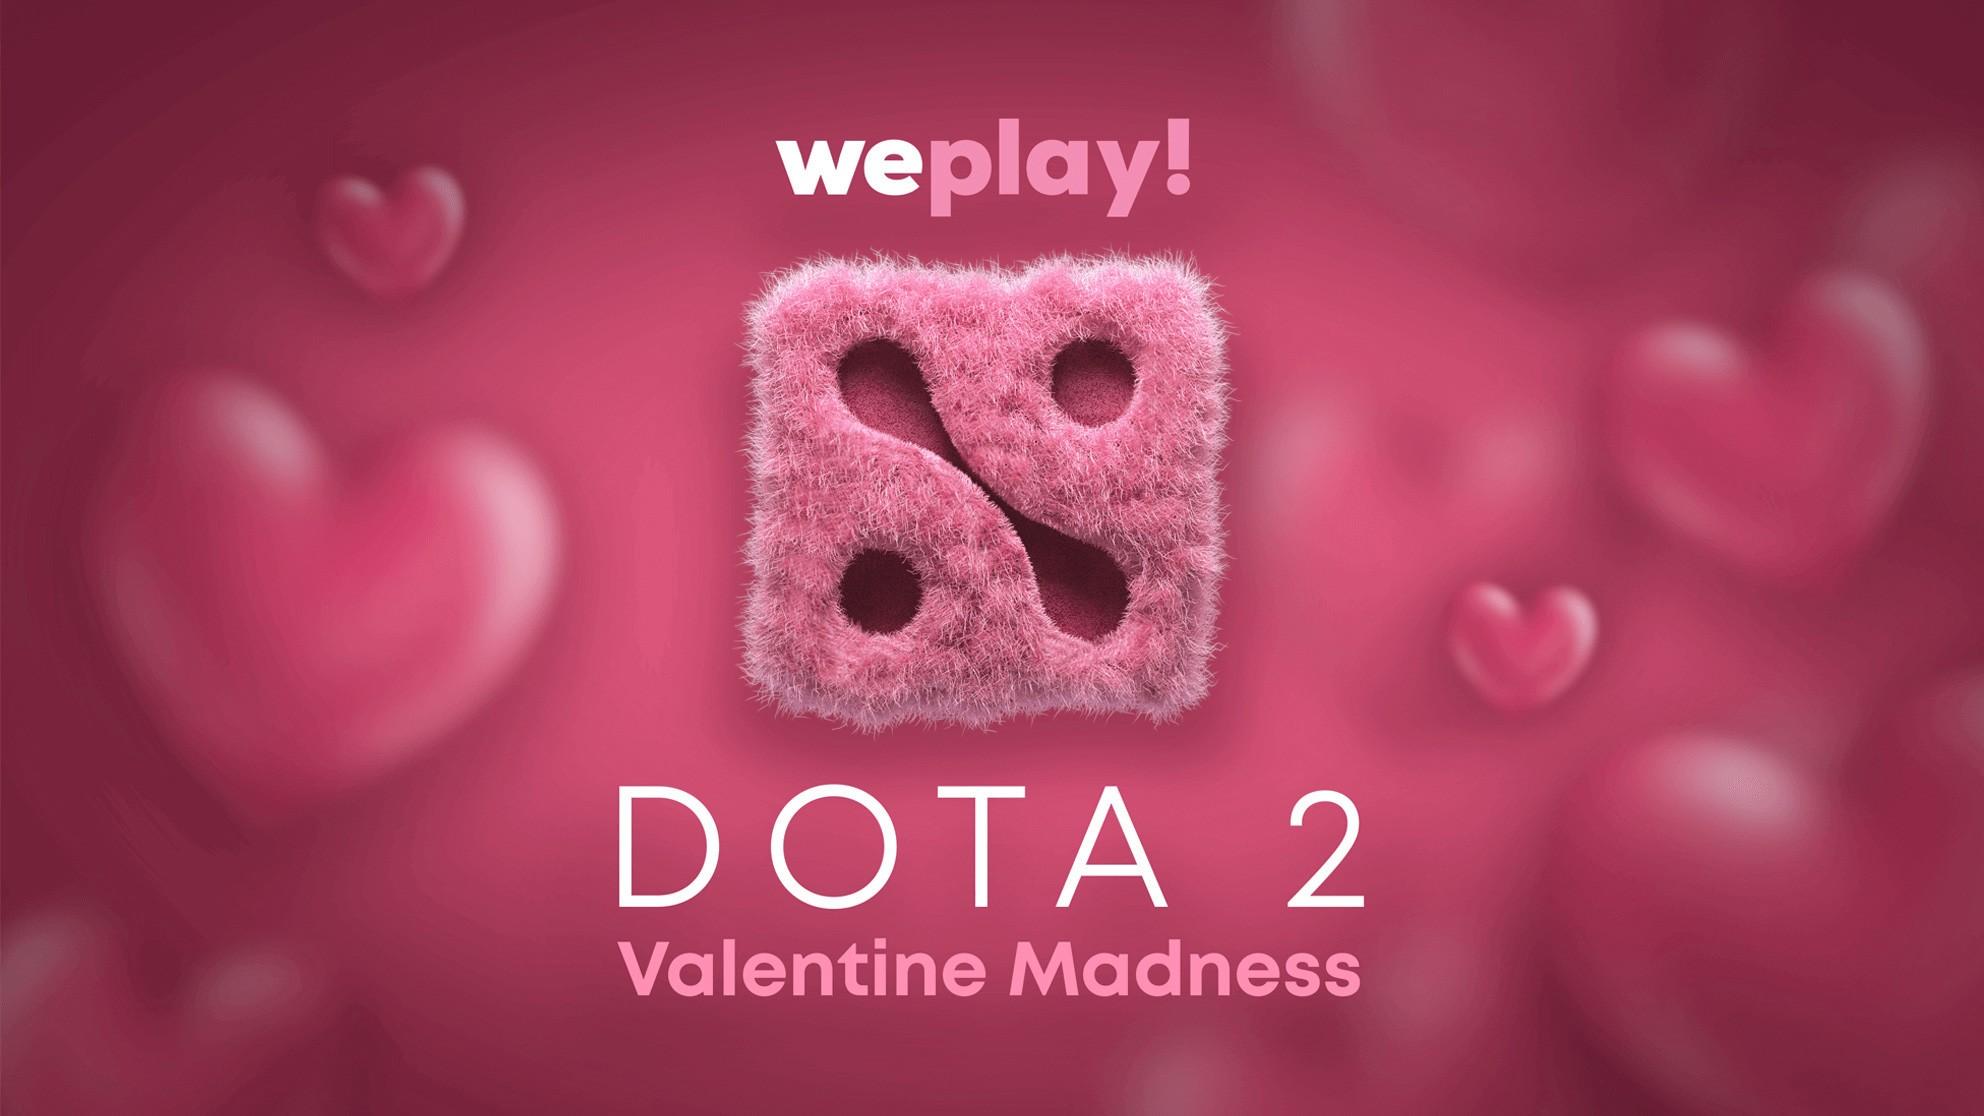 Анонс талантов на WePlay! Valentine Madness